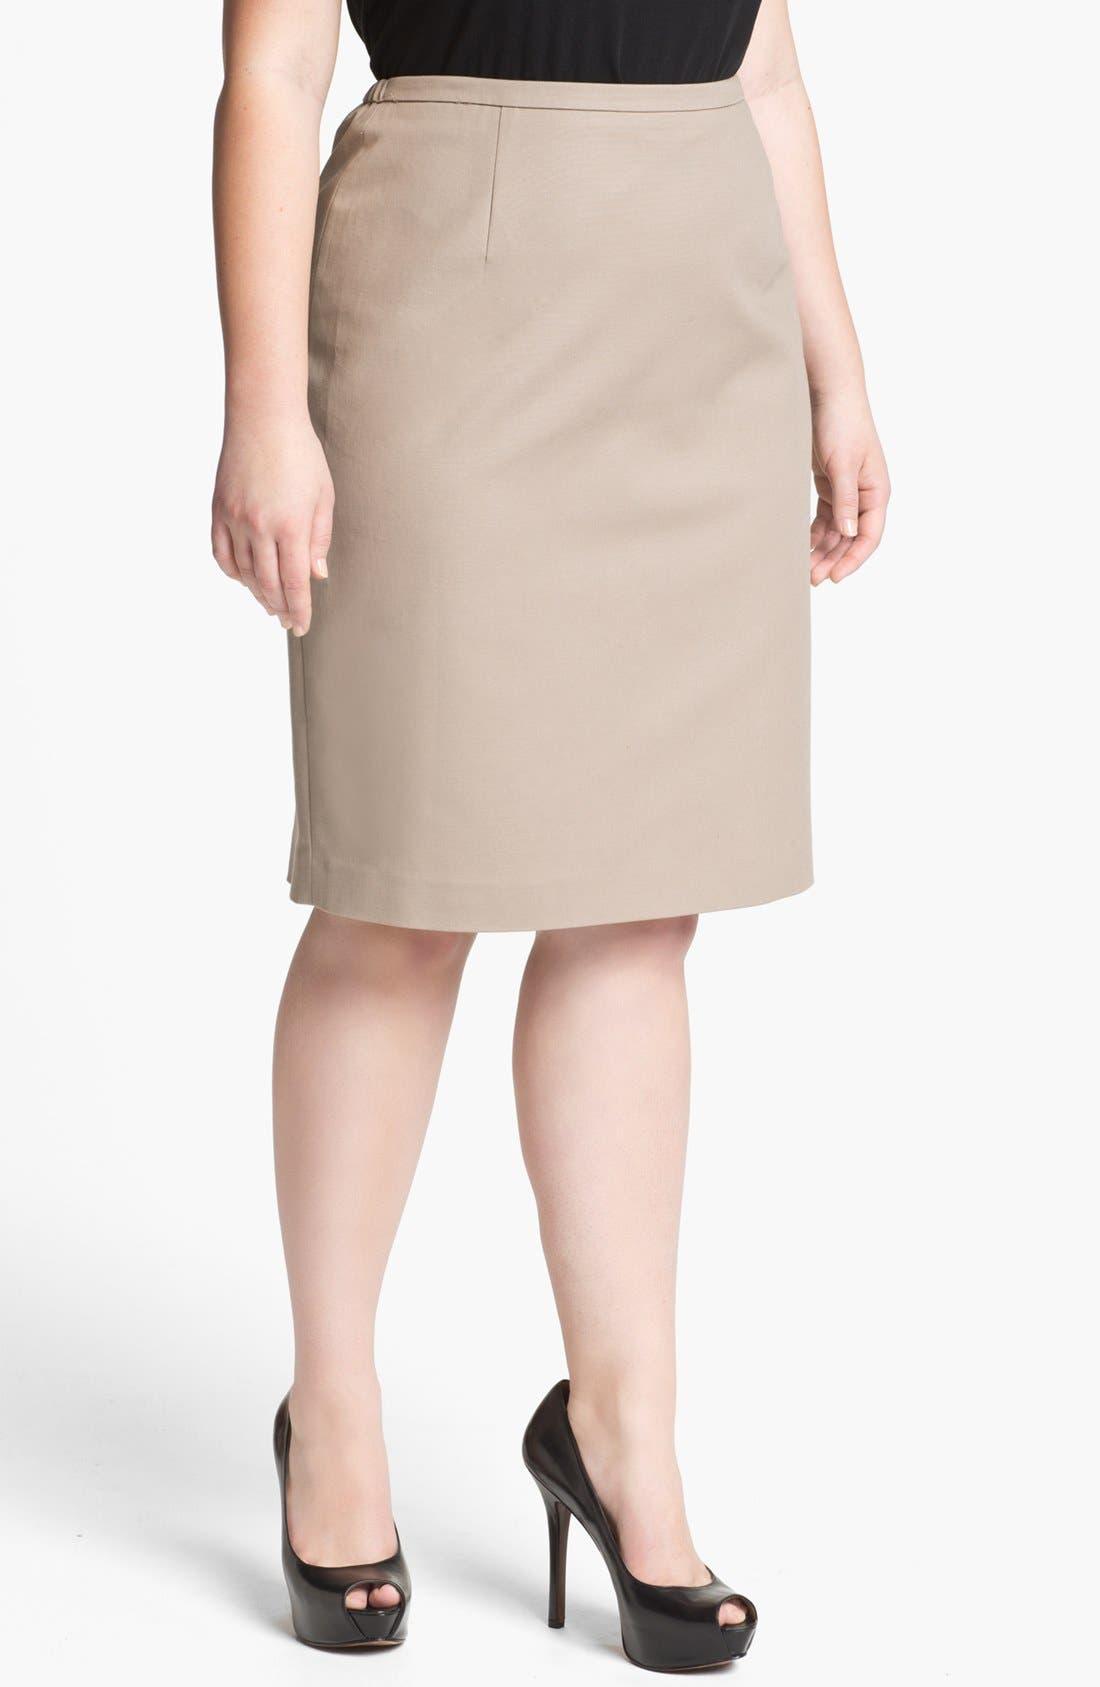 Alternate Image 1 Selected - Tahari Woman 'Zander' Pencil Skirt (Plus Size)